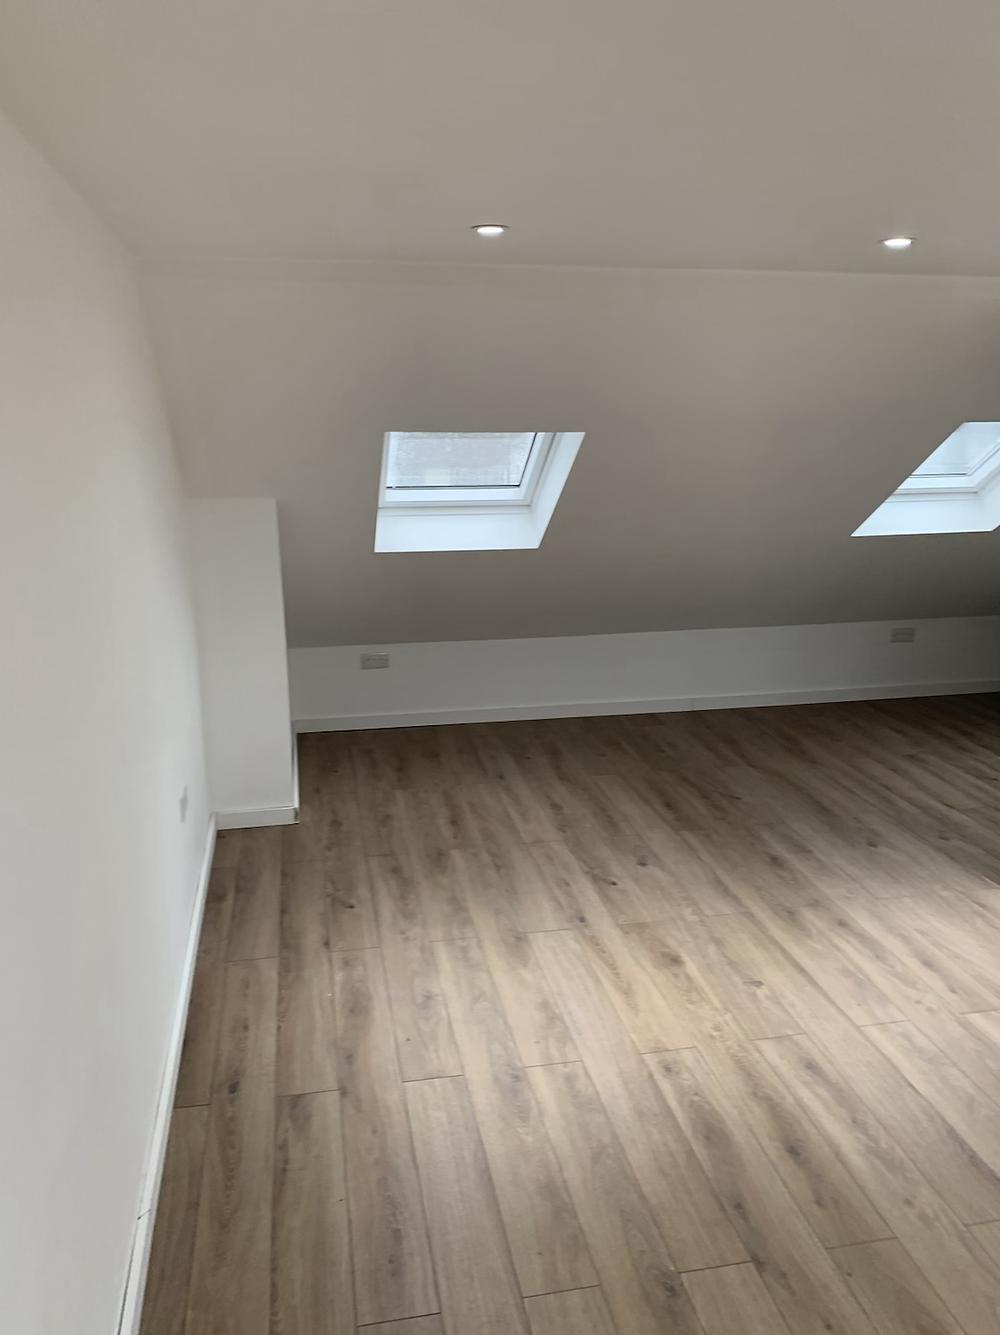 Hip to gable loft conversion Borehamwood WD6 Hertfordshire